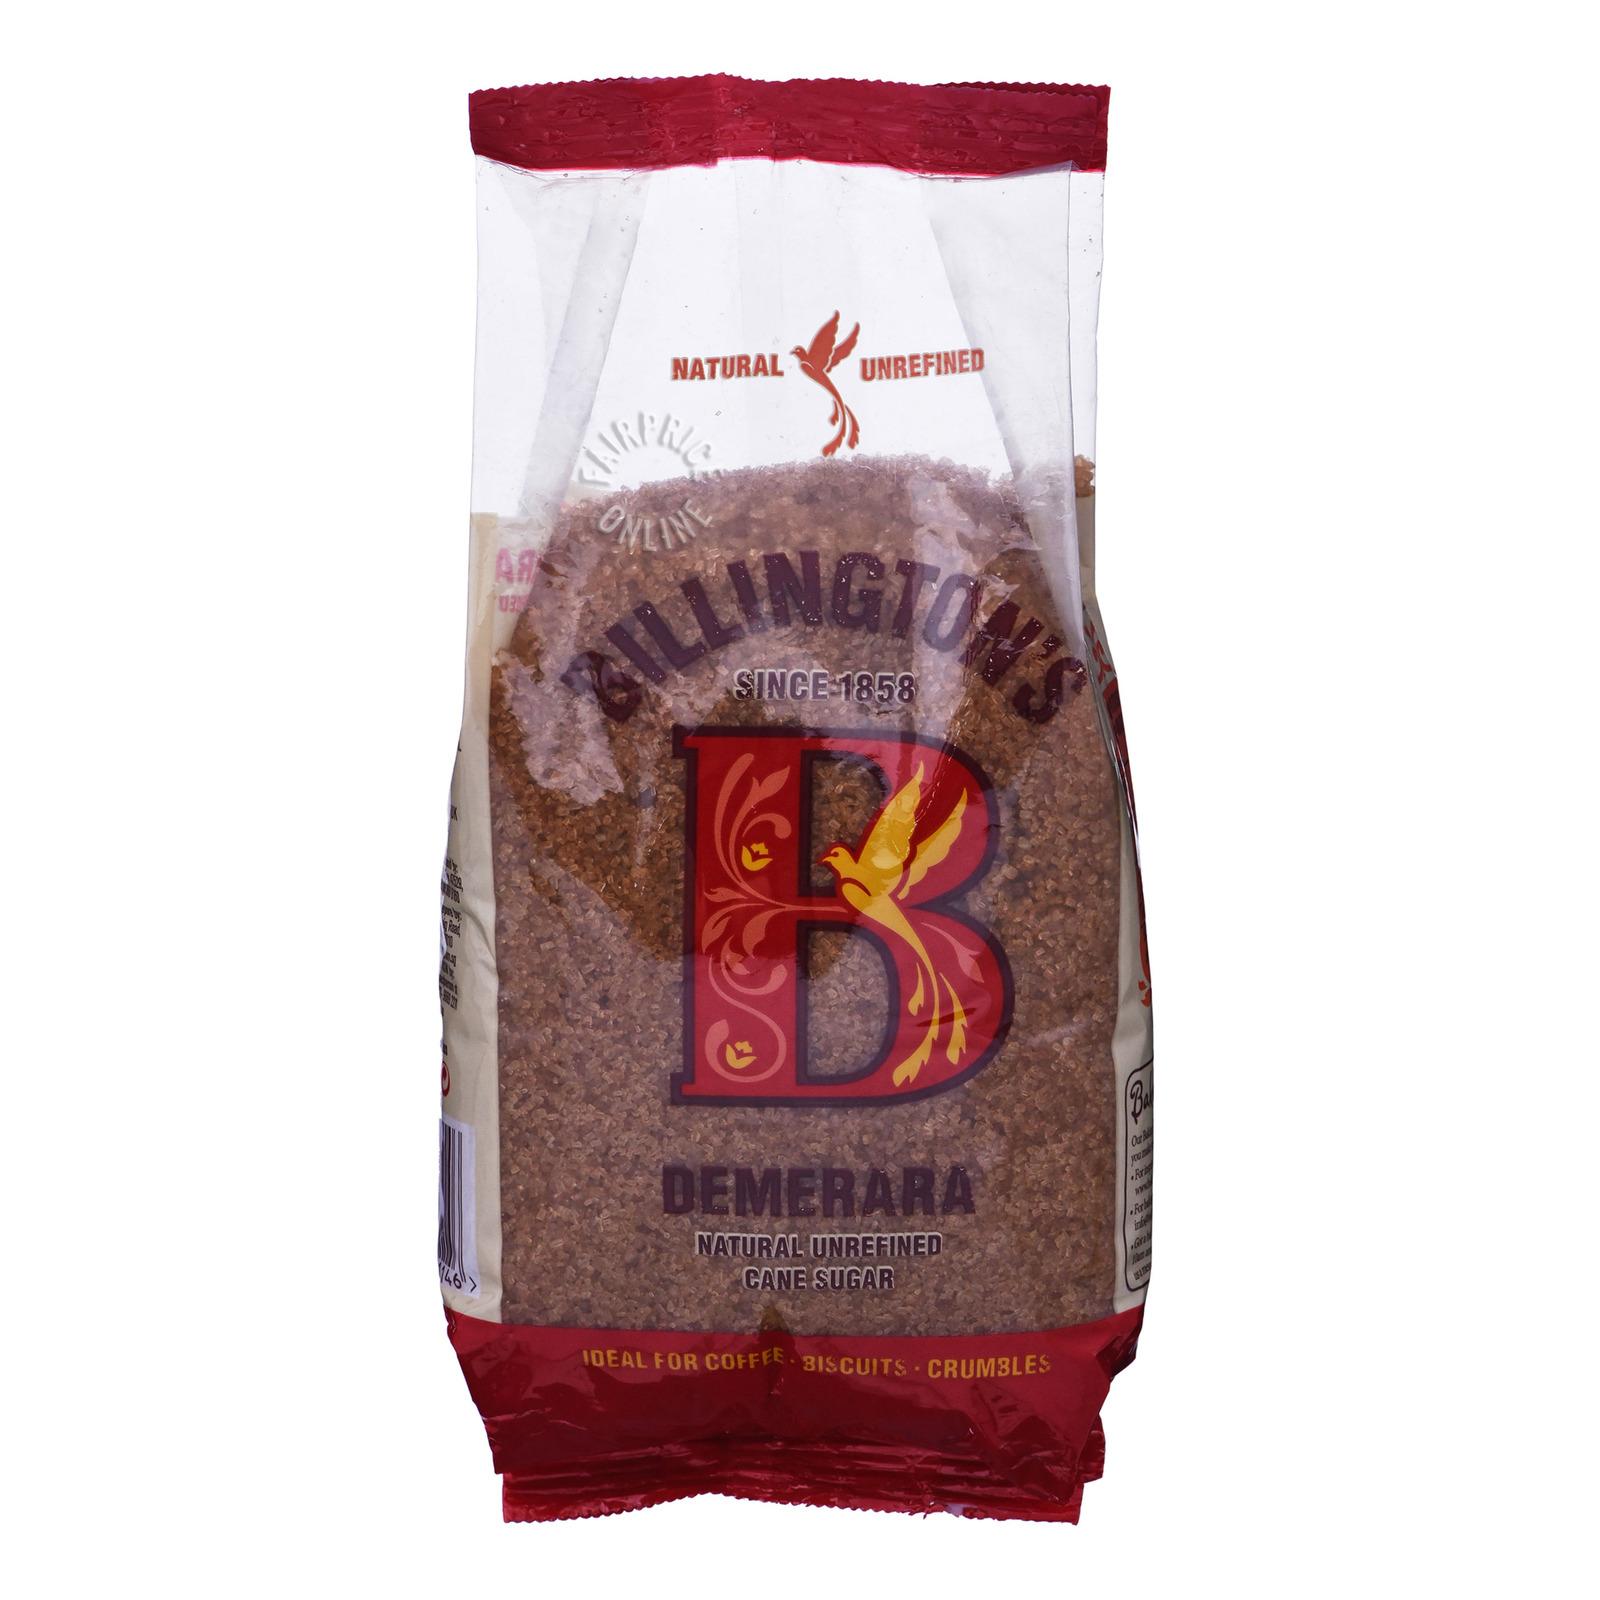 BILLINGTON Natural Unrefined Cane Sugar - Demerara 1kg